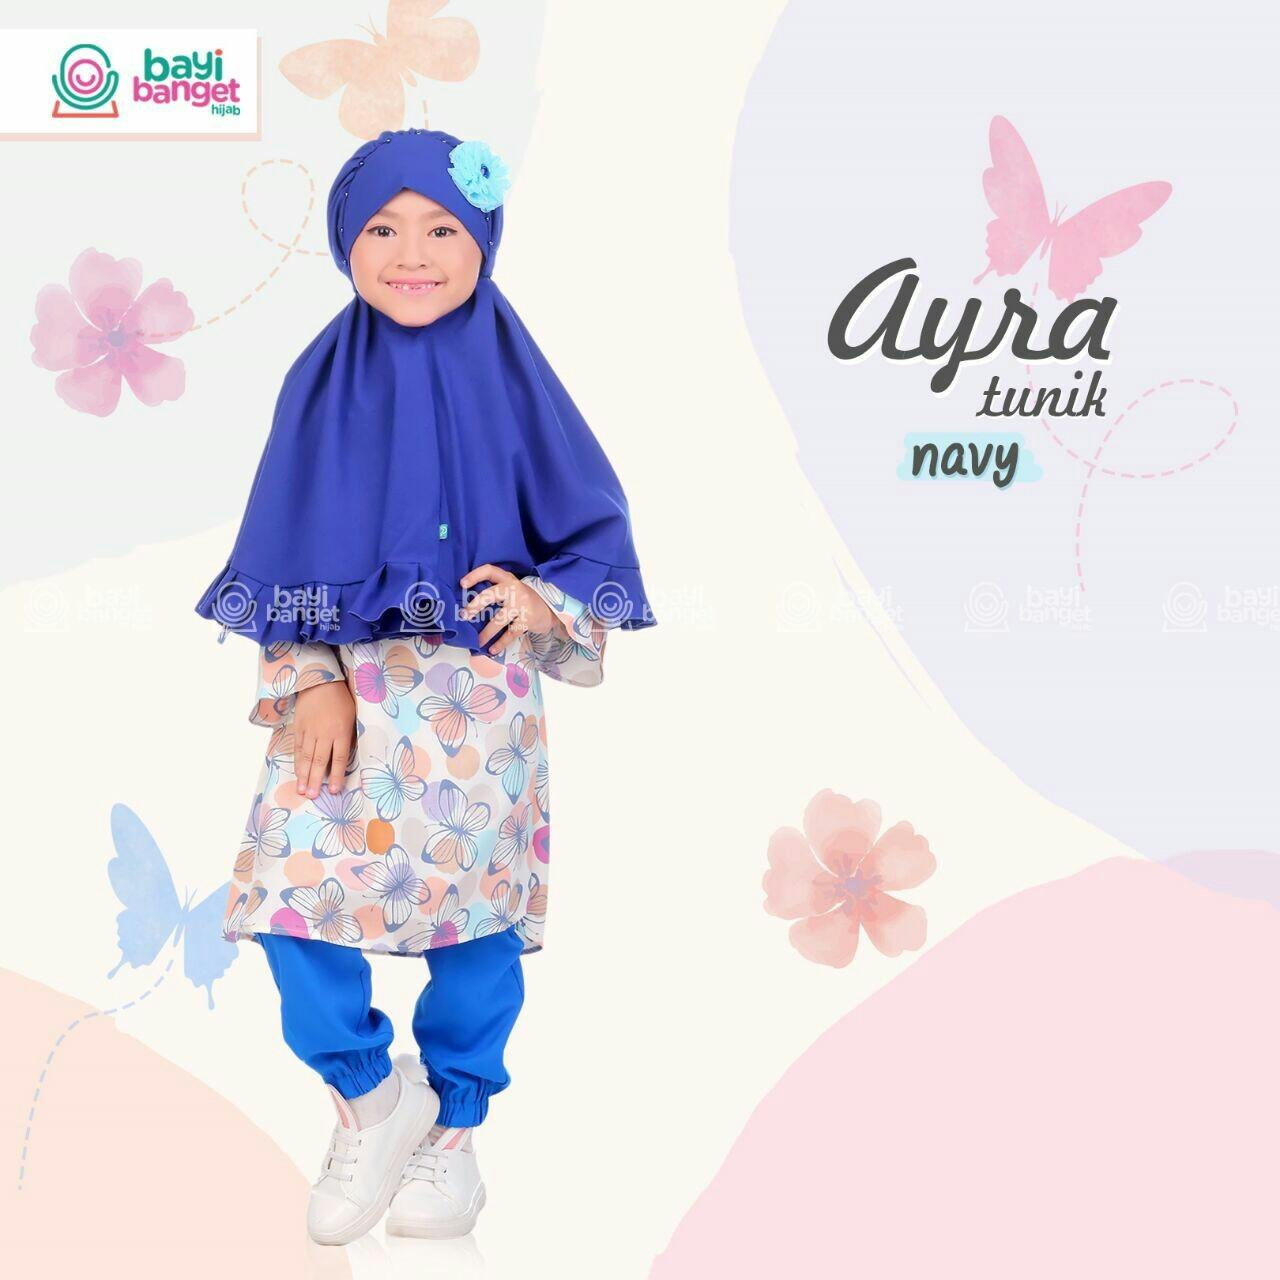 Fairuz Hijab, Baju Tunik Anak Perempeuan, Baju Muslim Anak setelan celana Joger, Busana Muslim Anak bermerk warna navy ( biru Dongker )